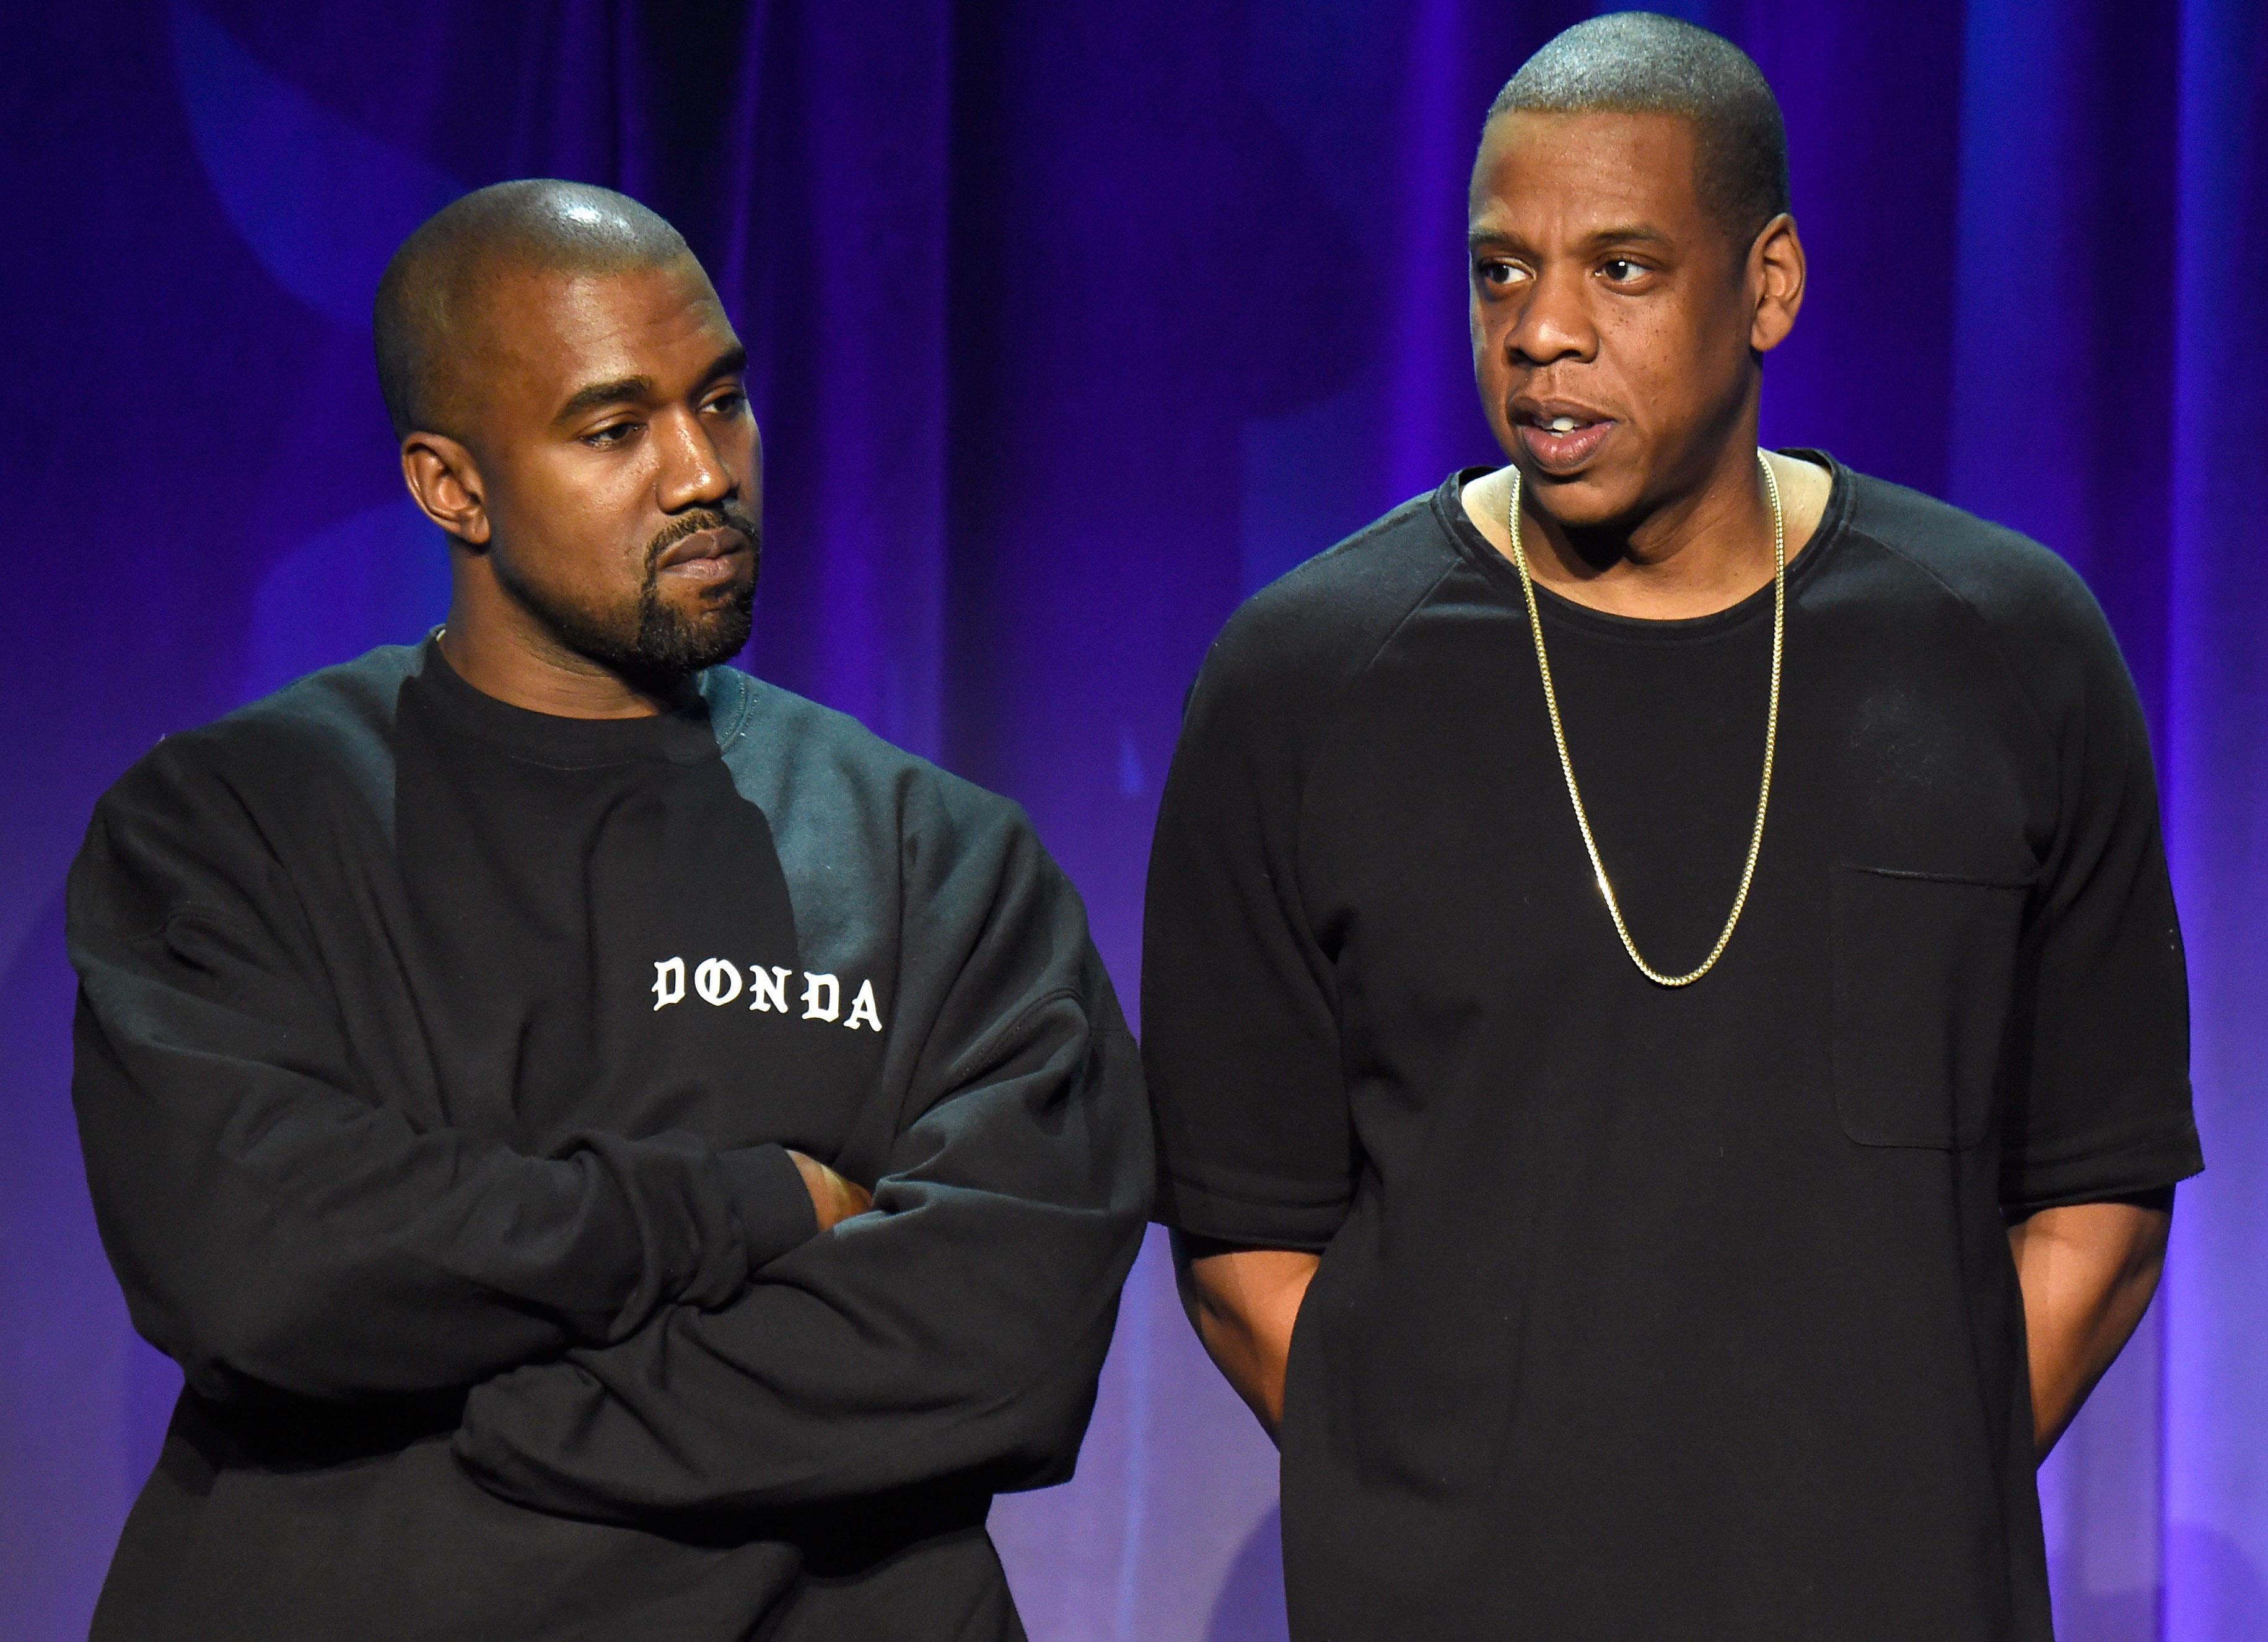 Jay Z Breaks Twitter Silence To Clarify Kanye West Lyric Cbs News